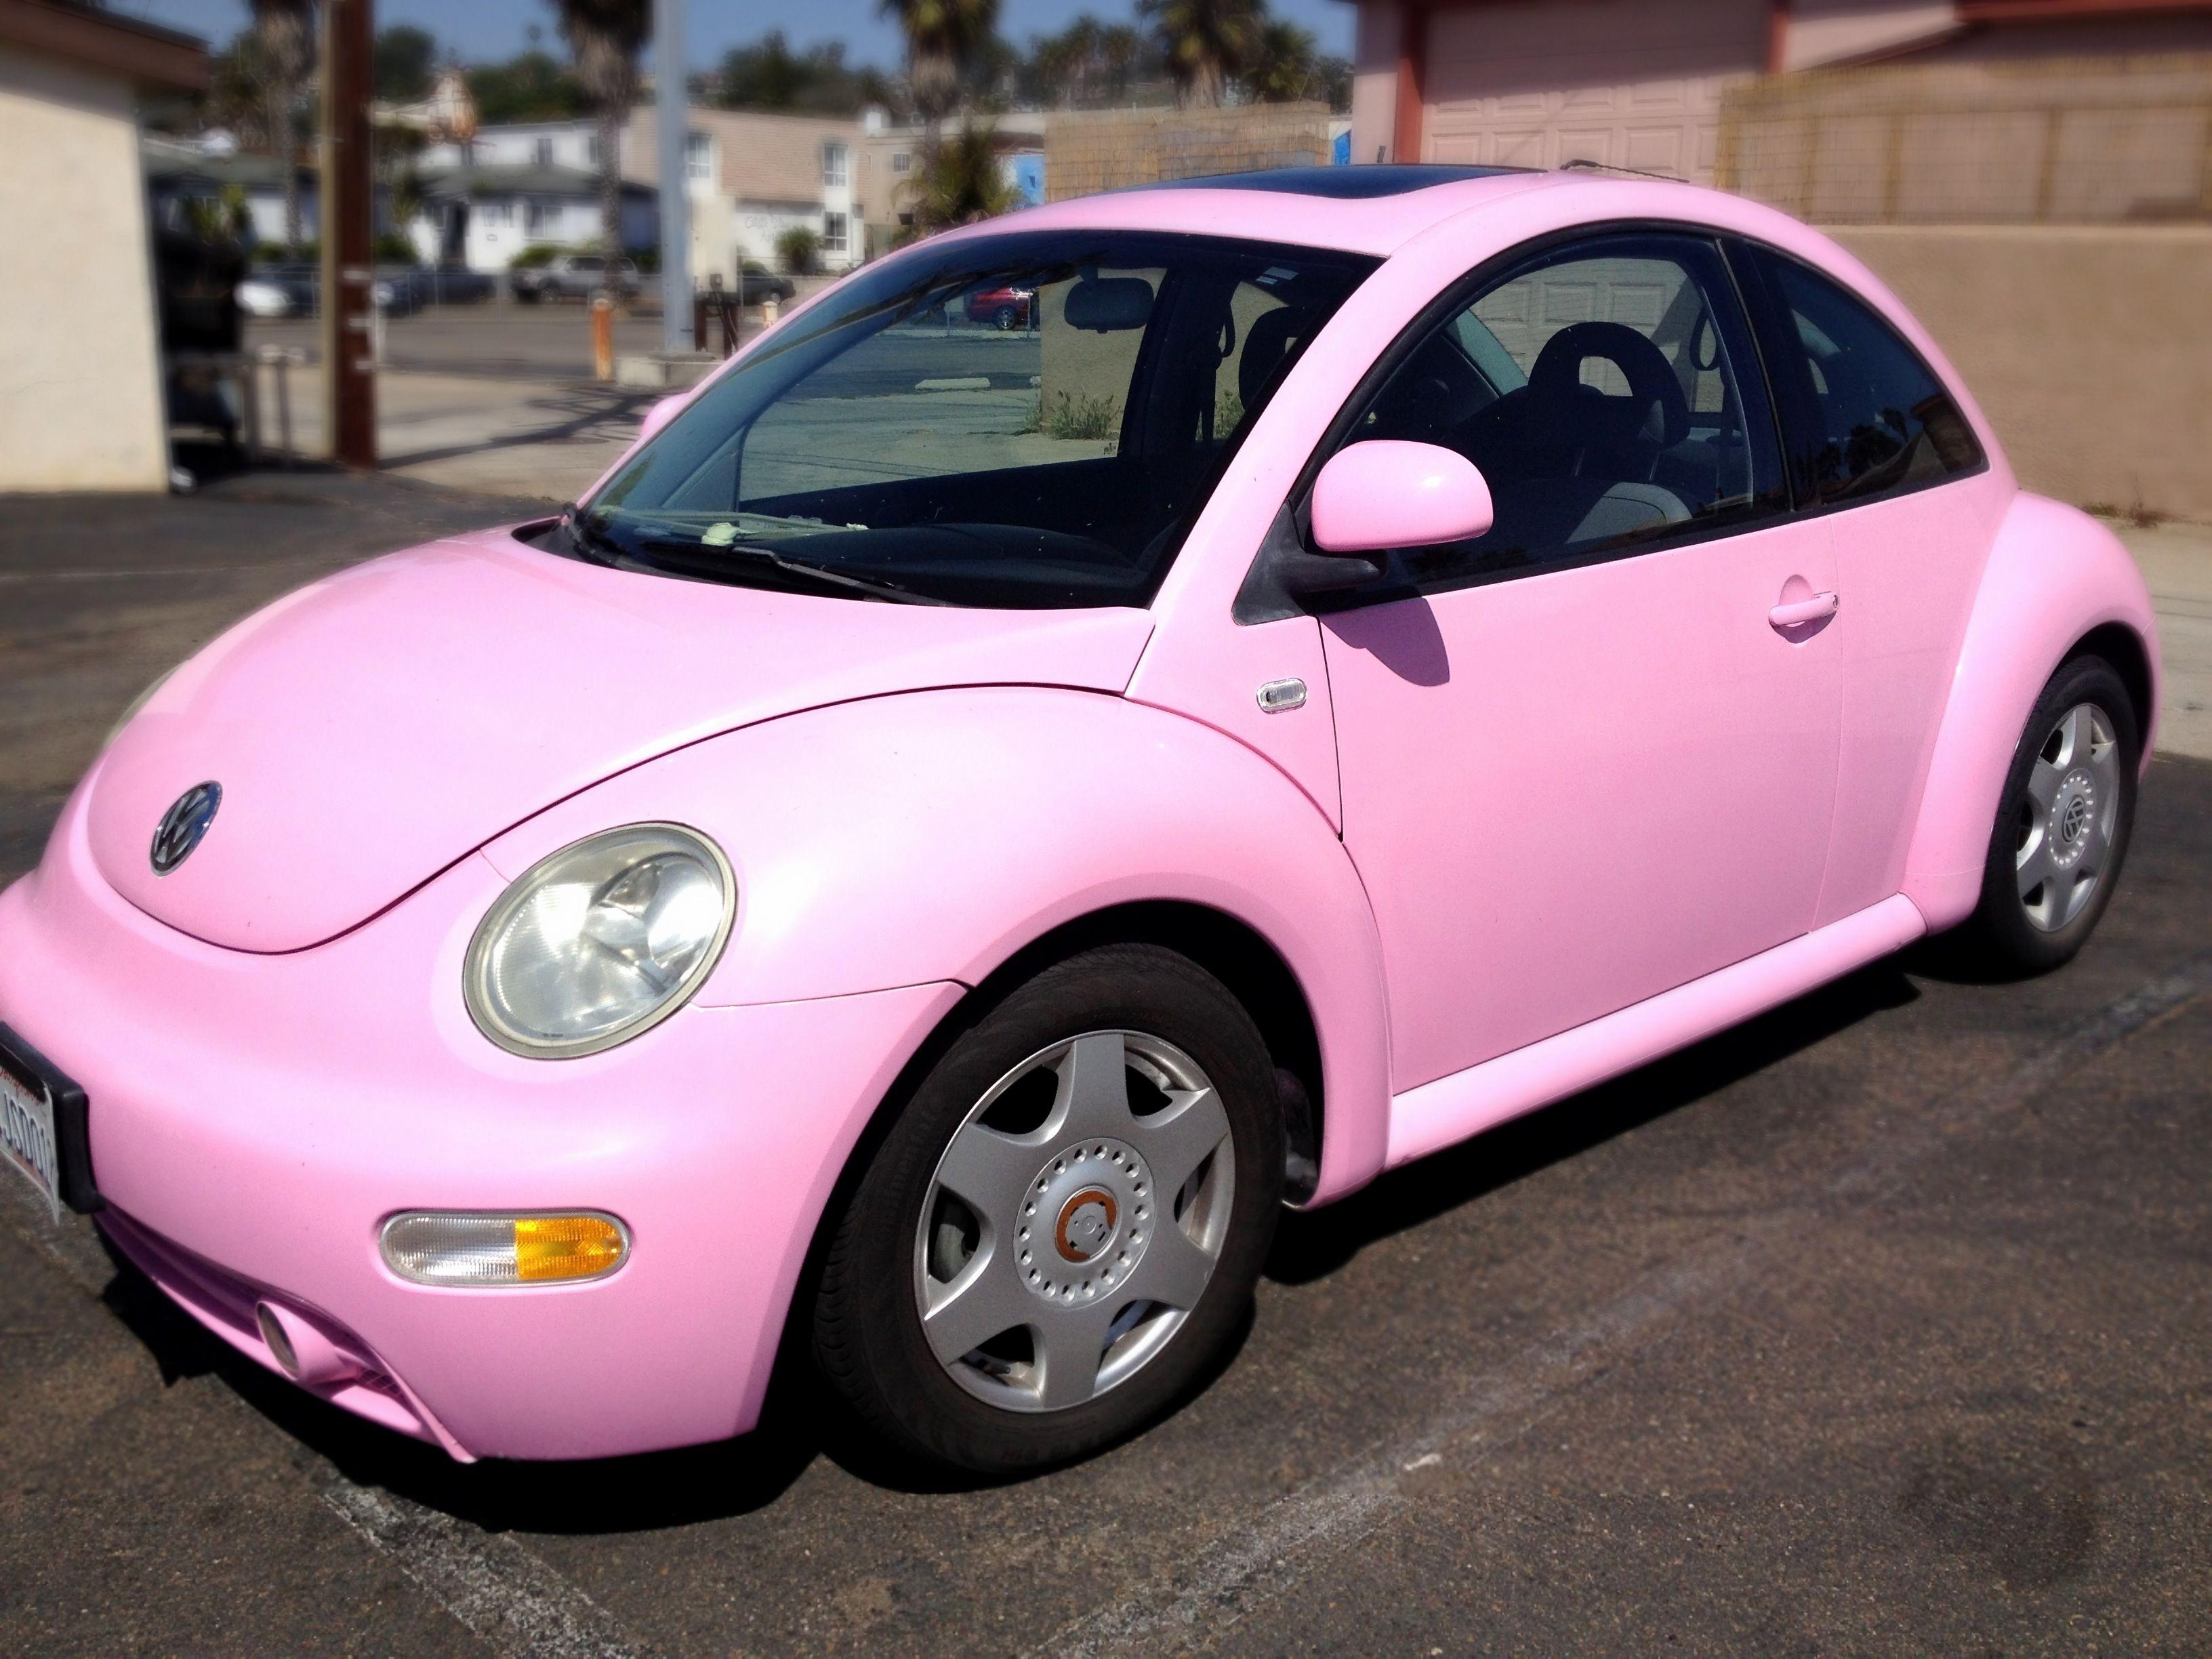 Punch Buggy Volkswagen >> Pink Vw Bug Pink Dream Cars Cars Volkswagen